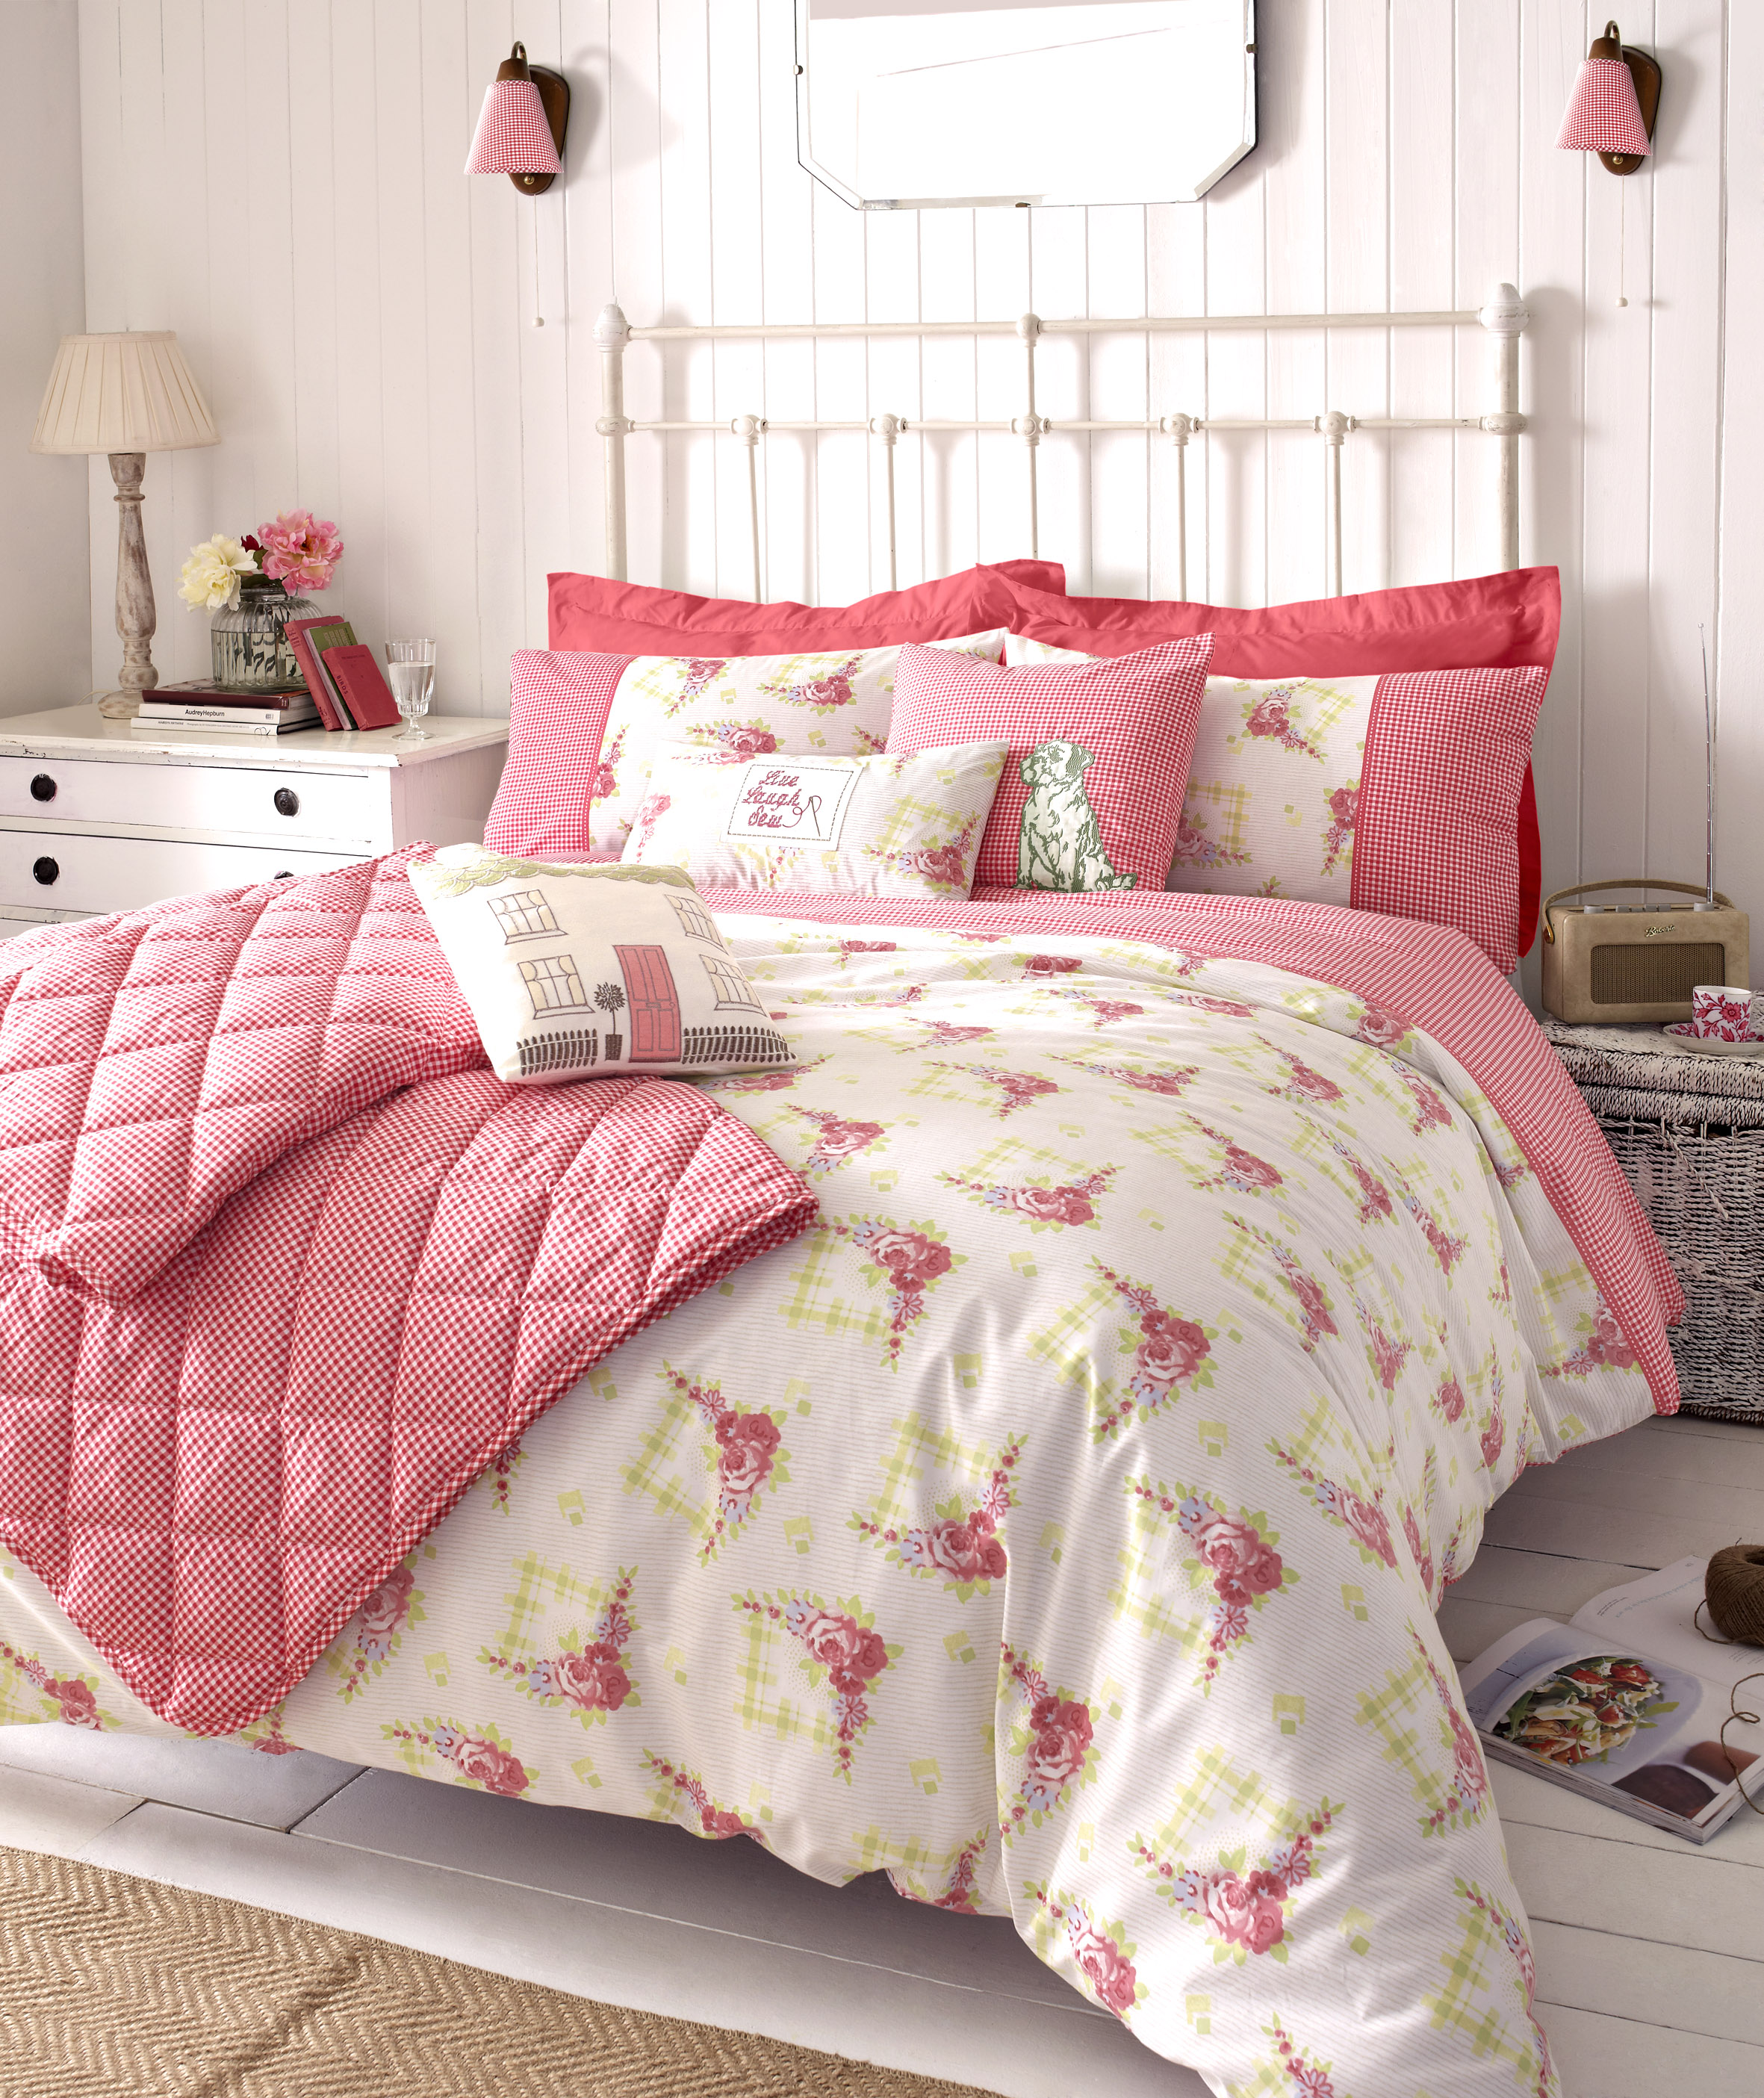 Must Have Essentials in Bedroom | My Decorative